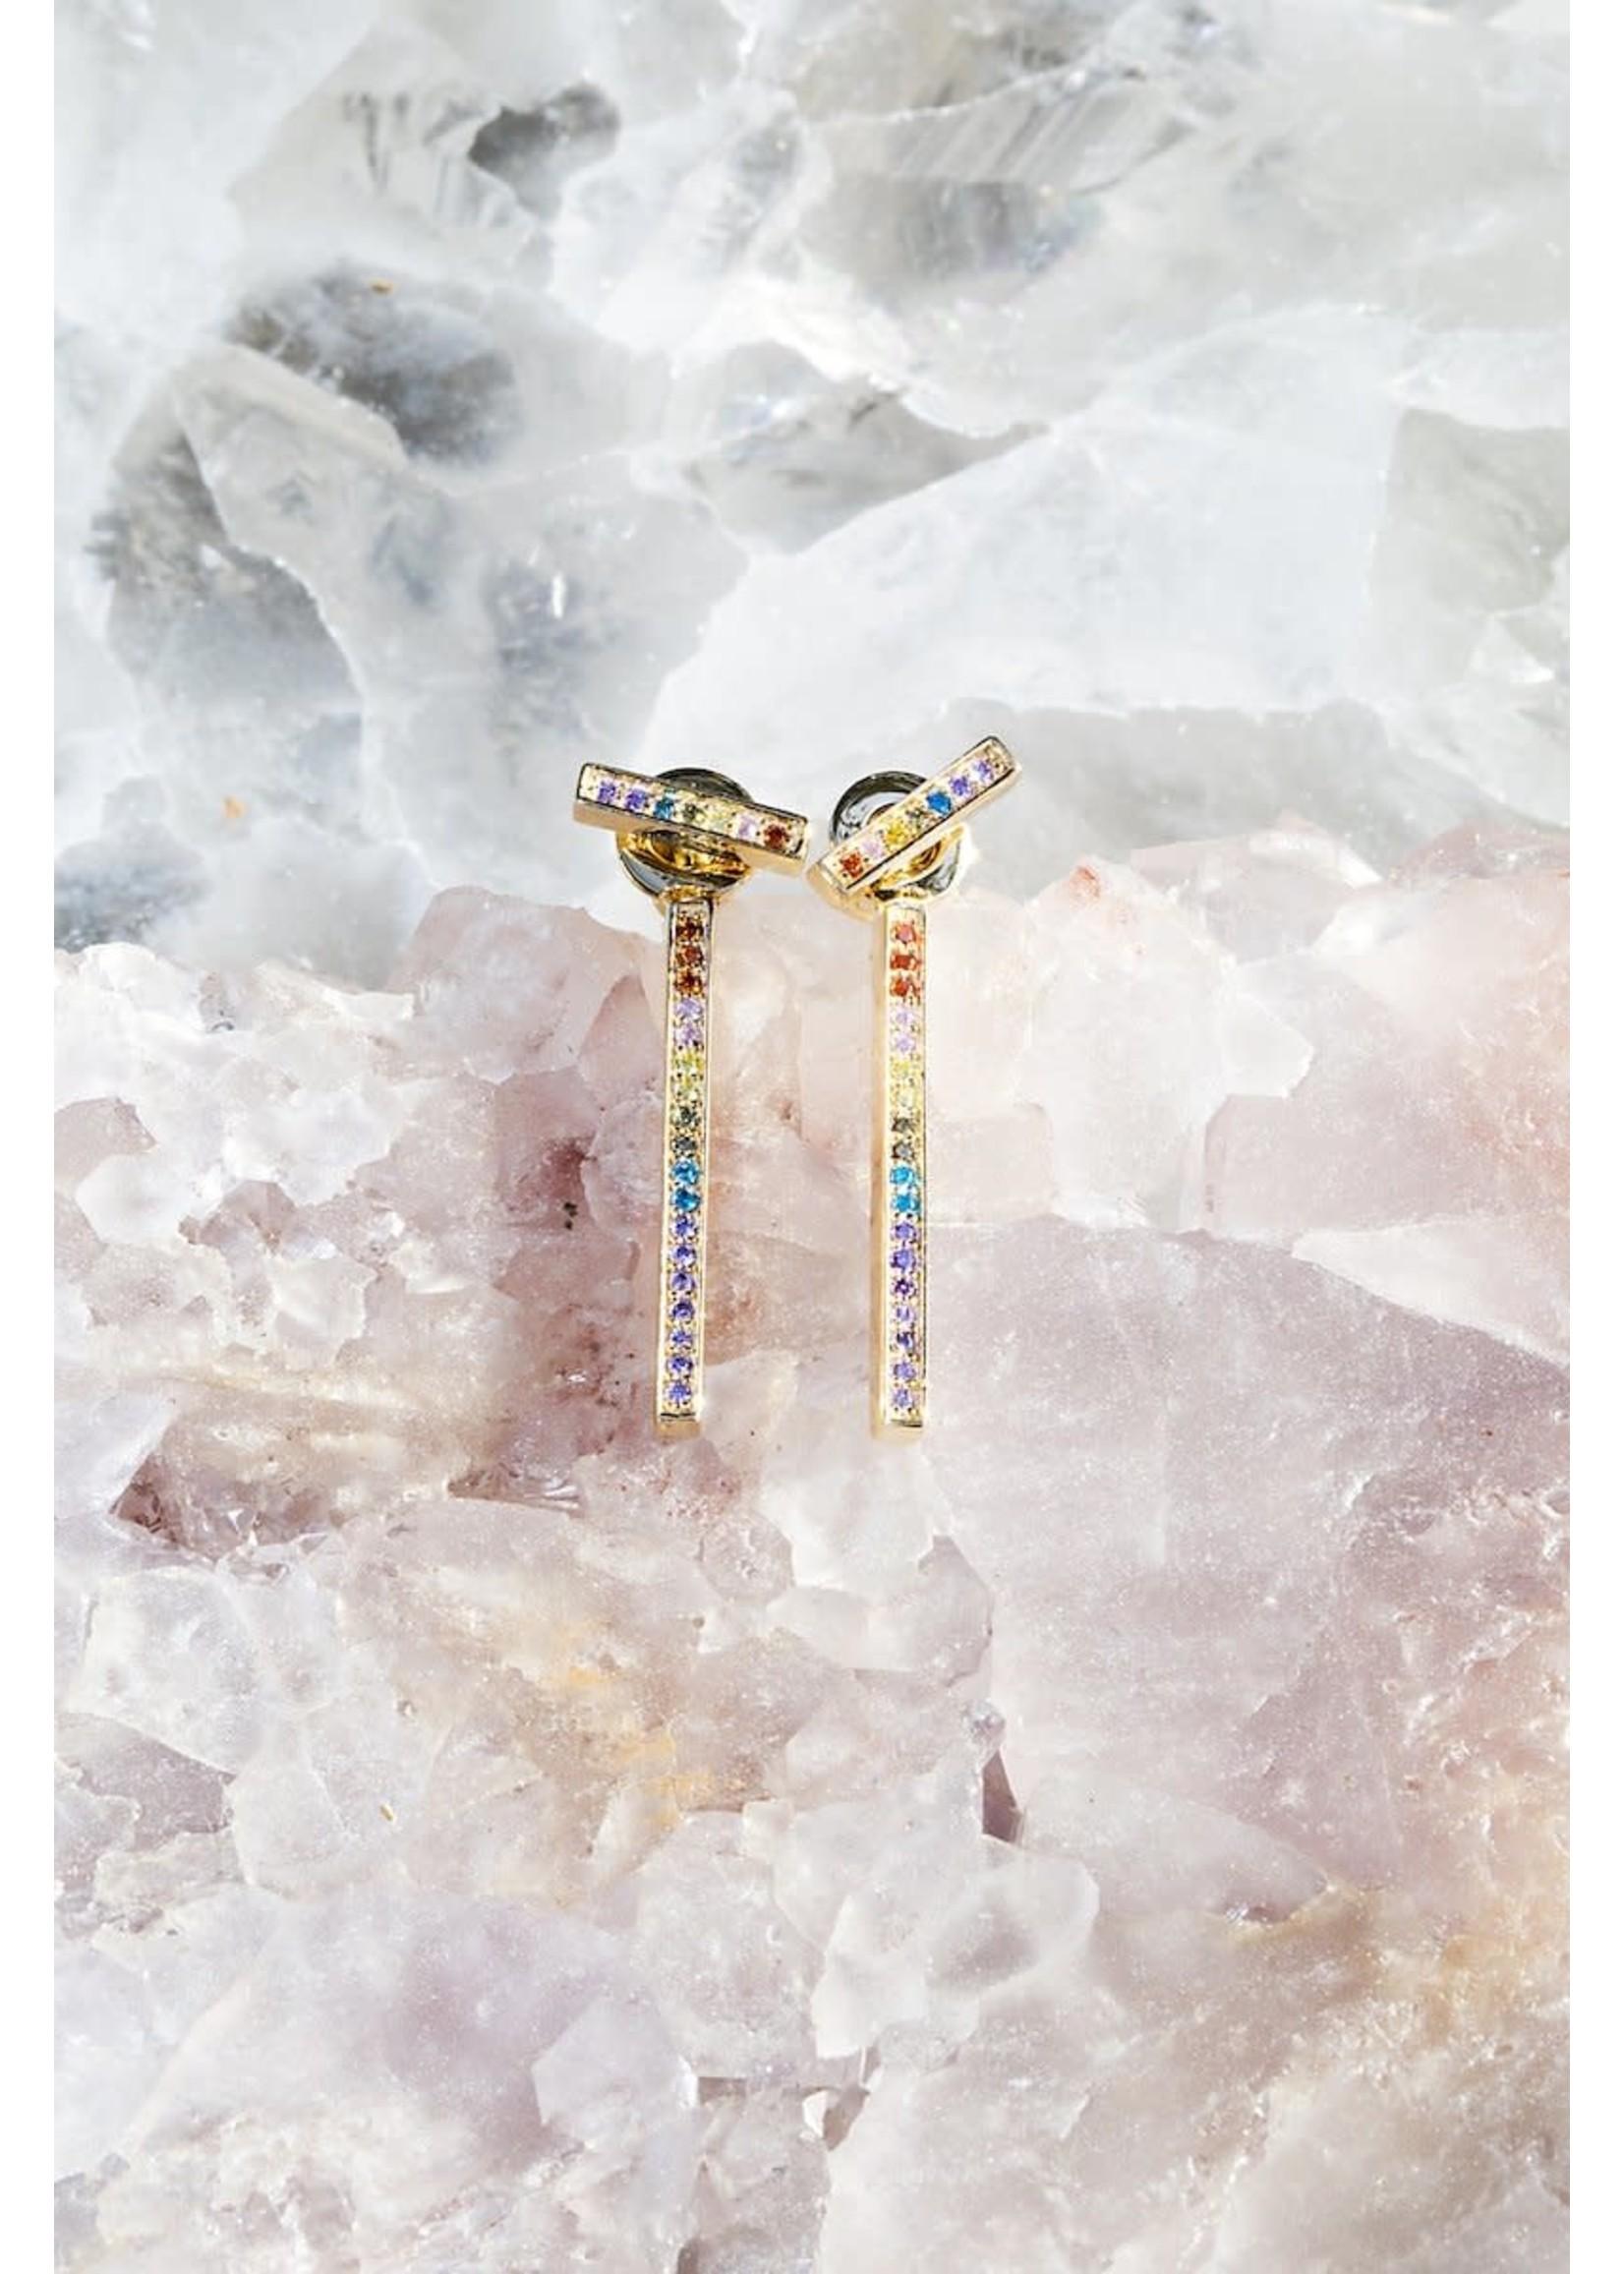 Native Gem Secrets Rainbow Earrings